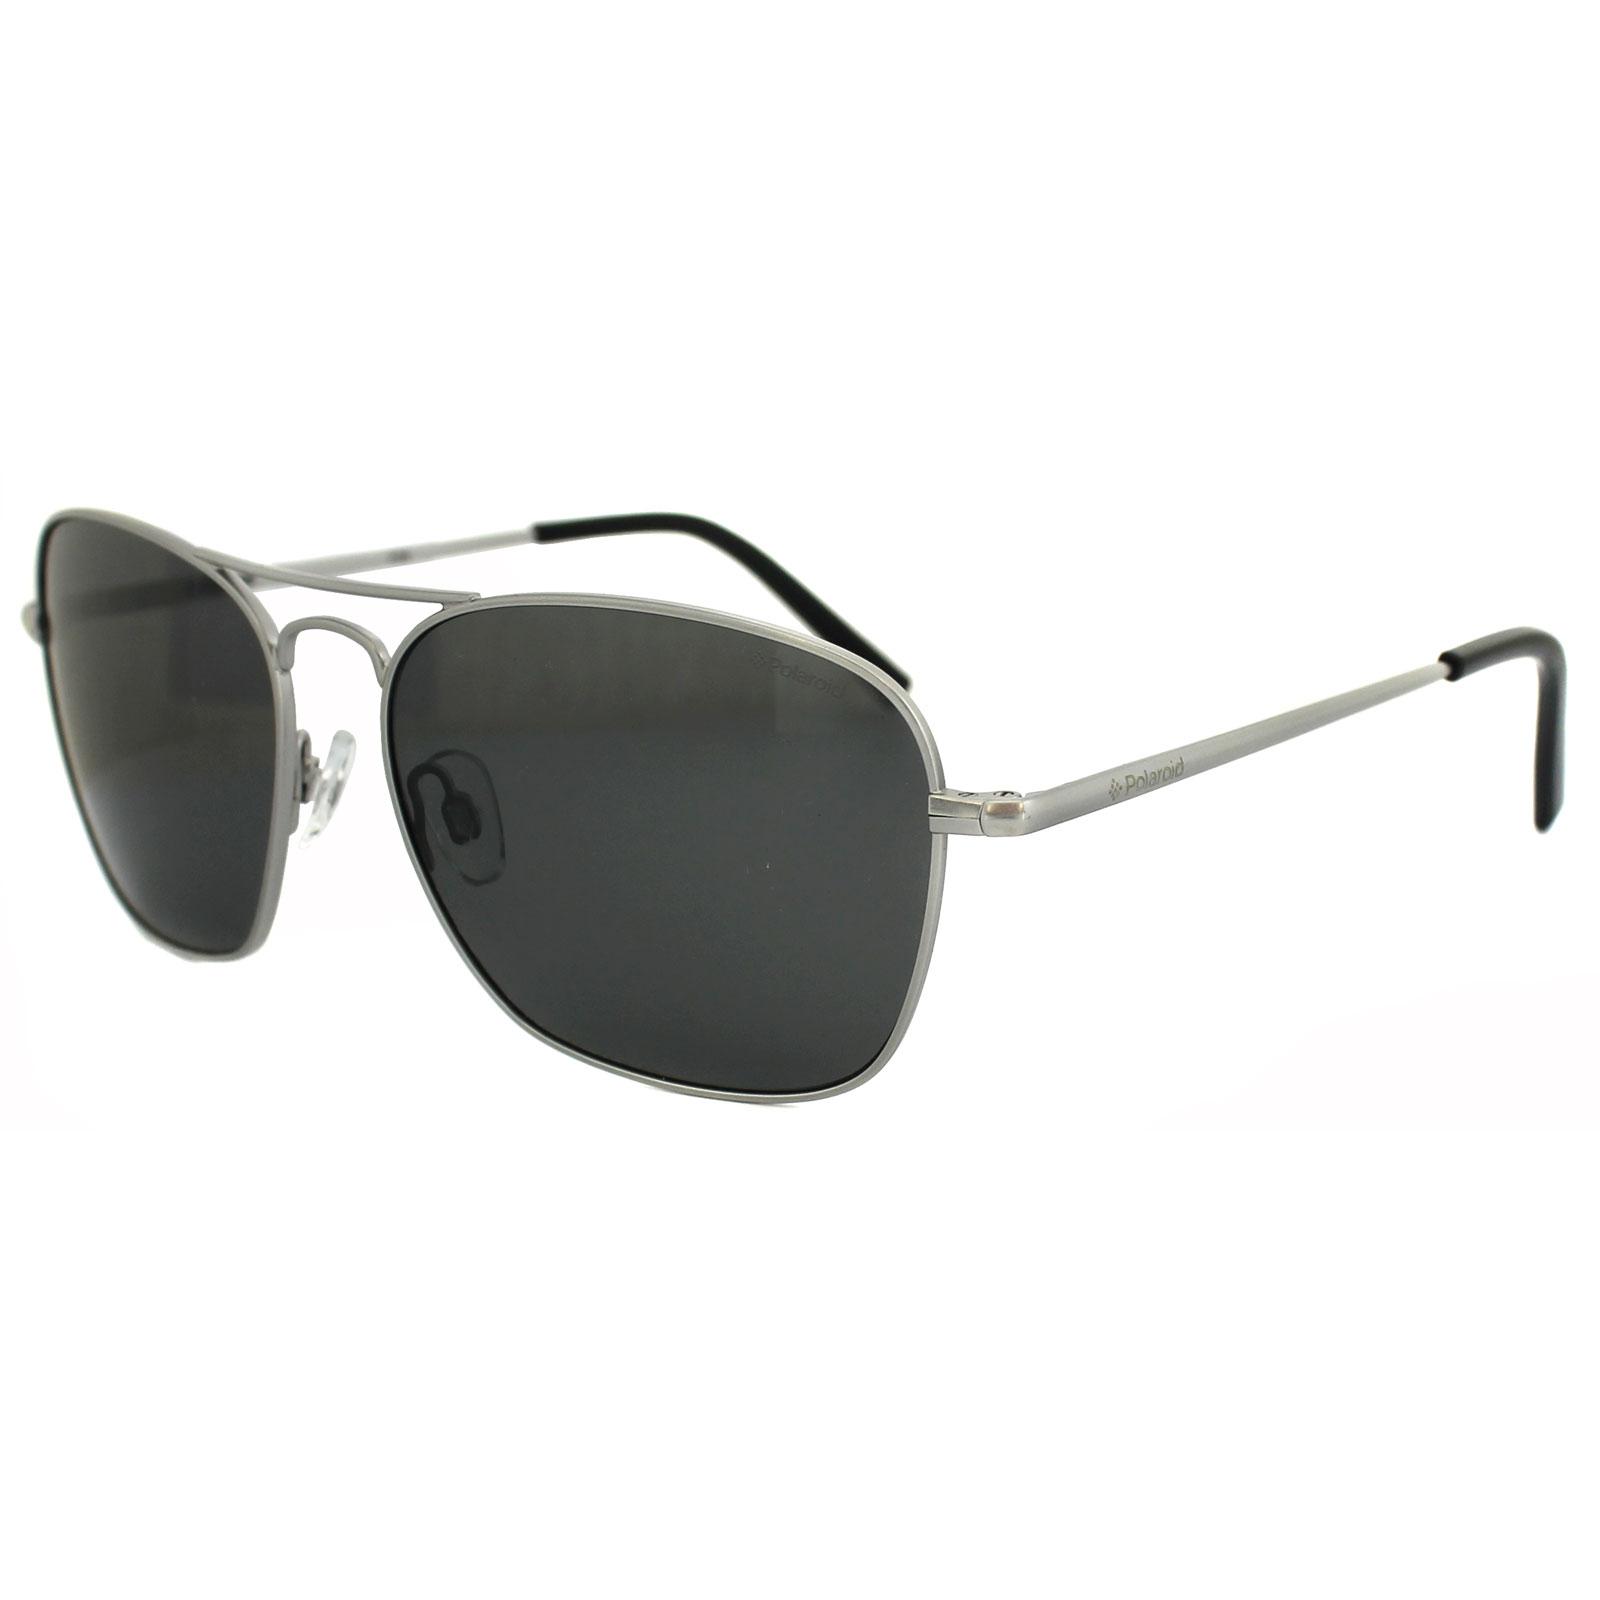 ed5afc536d5 Sentinel Polaroid Plus Sunglasses PLD 1003 S O11 AH Matt Palladium Grey  Polarized